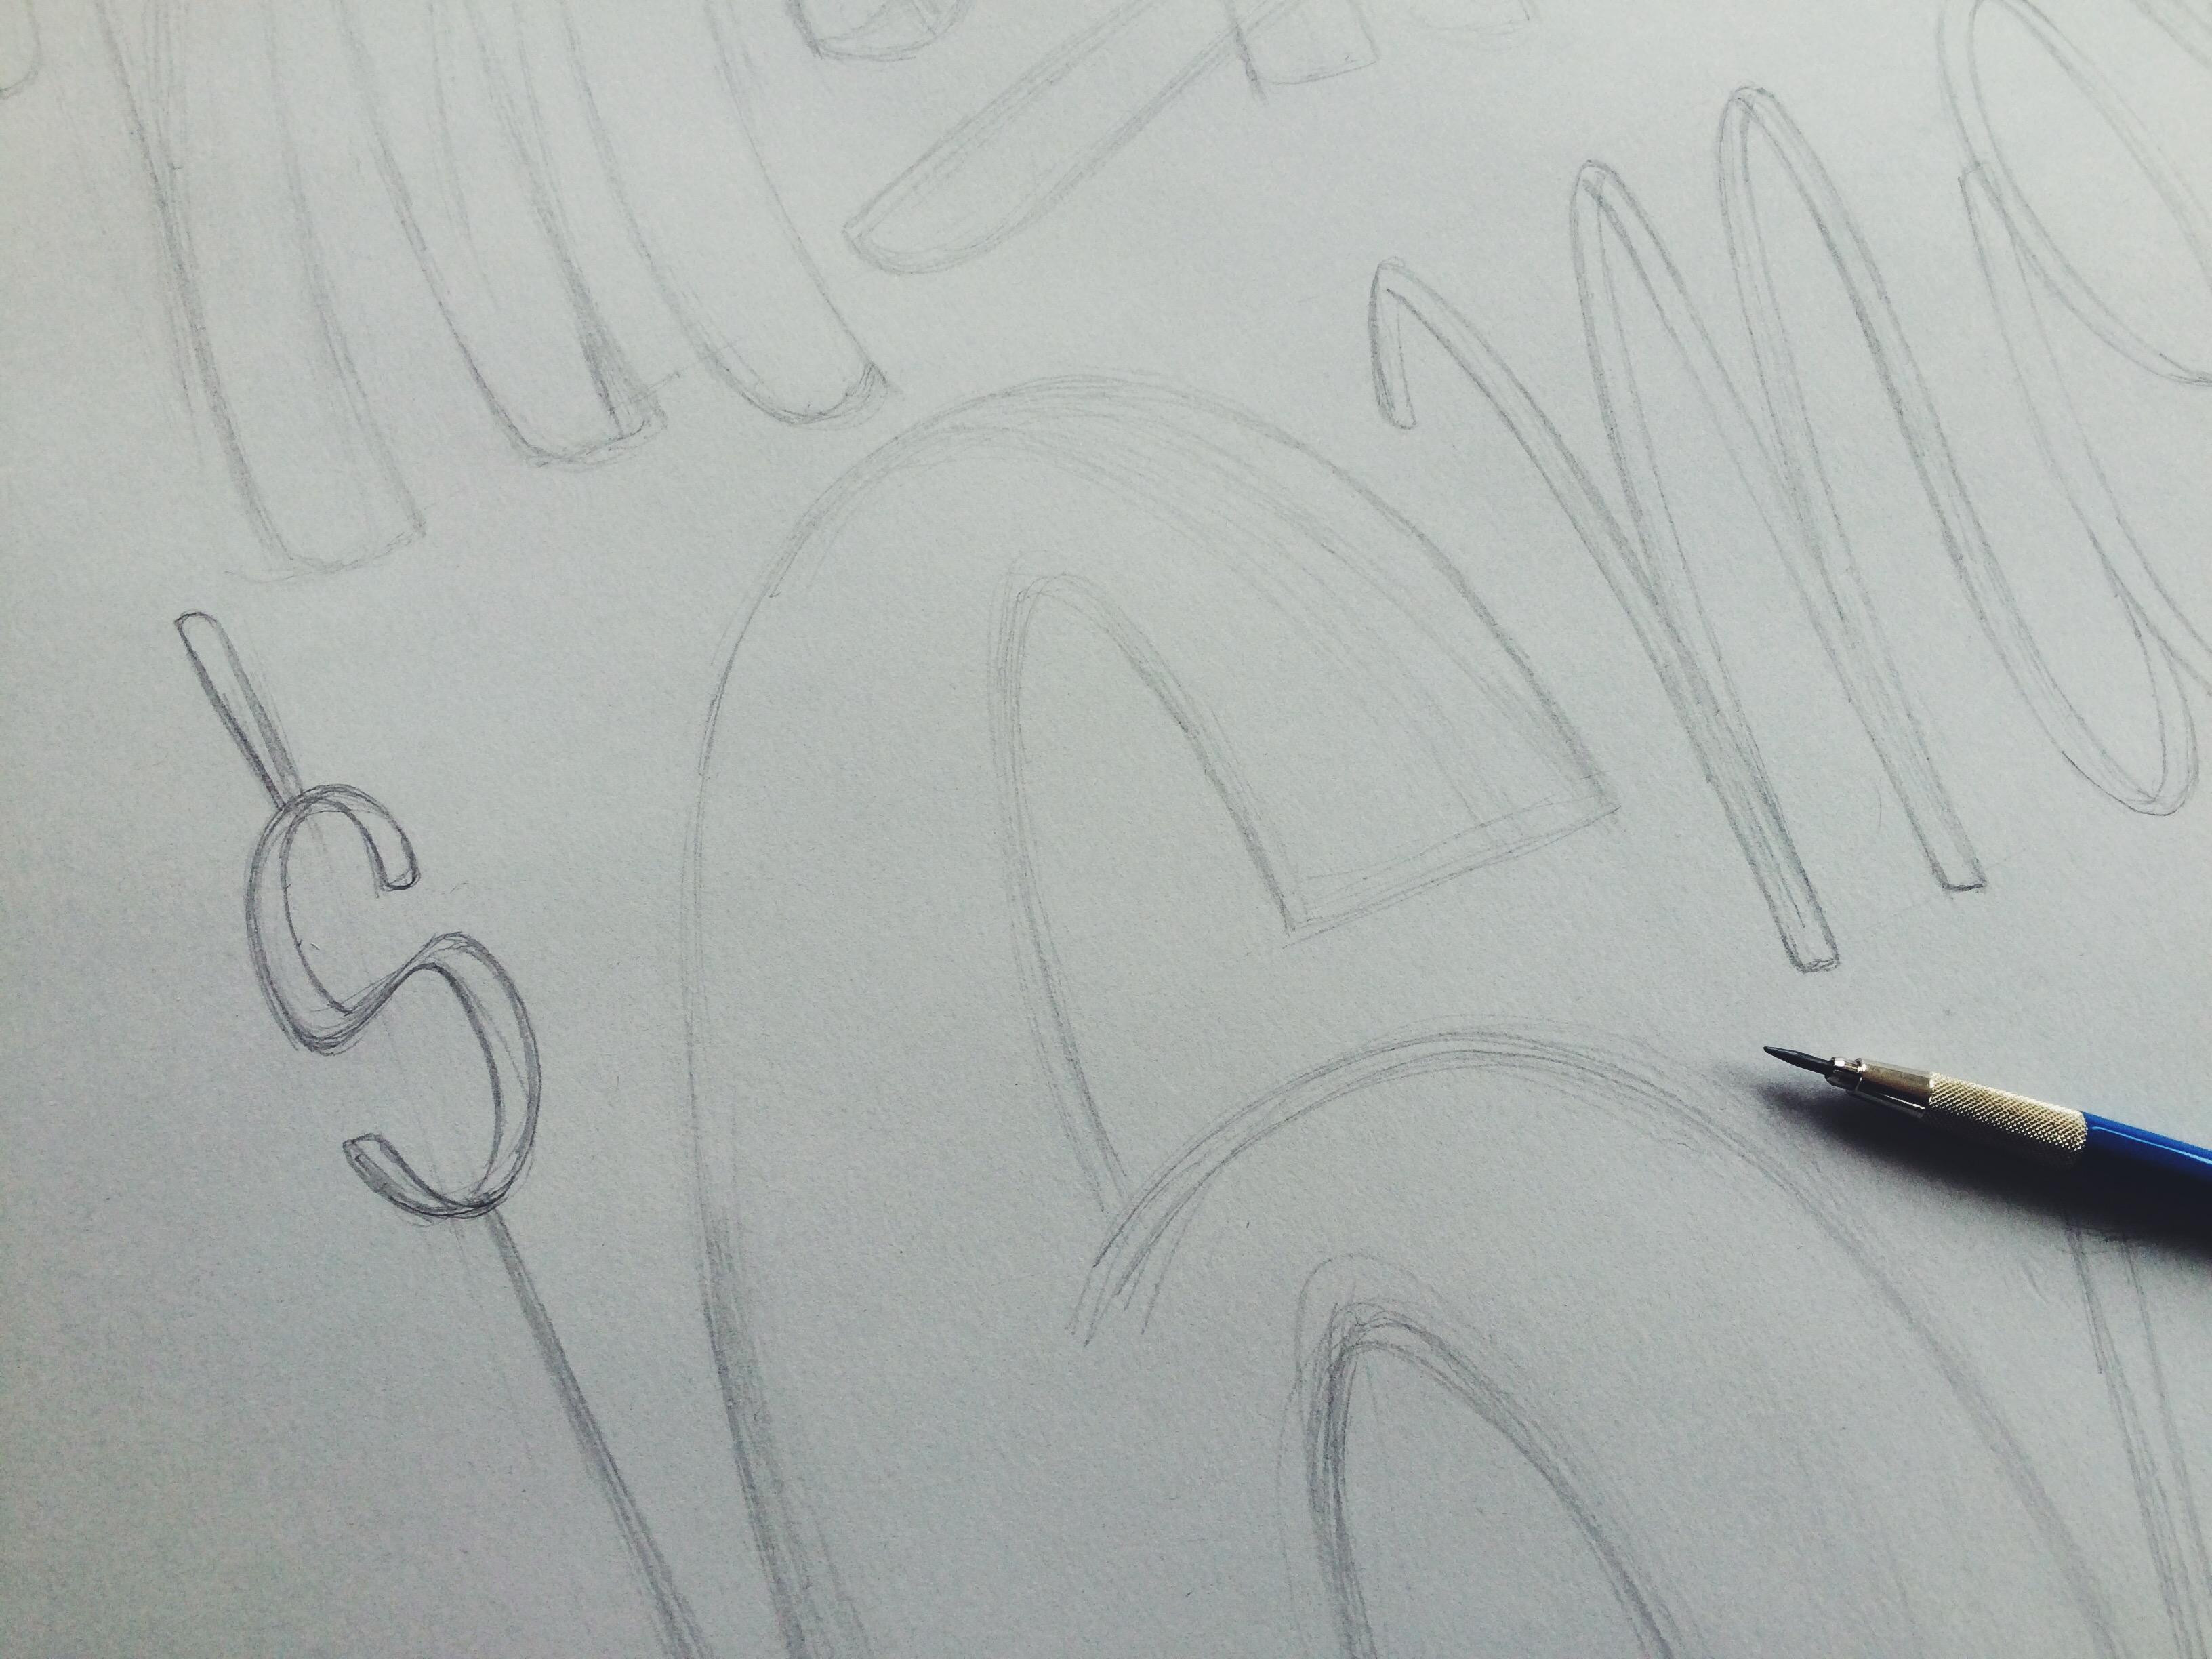 Studmuffin fullpencil detail bobewing